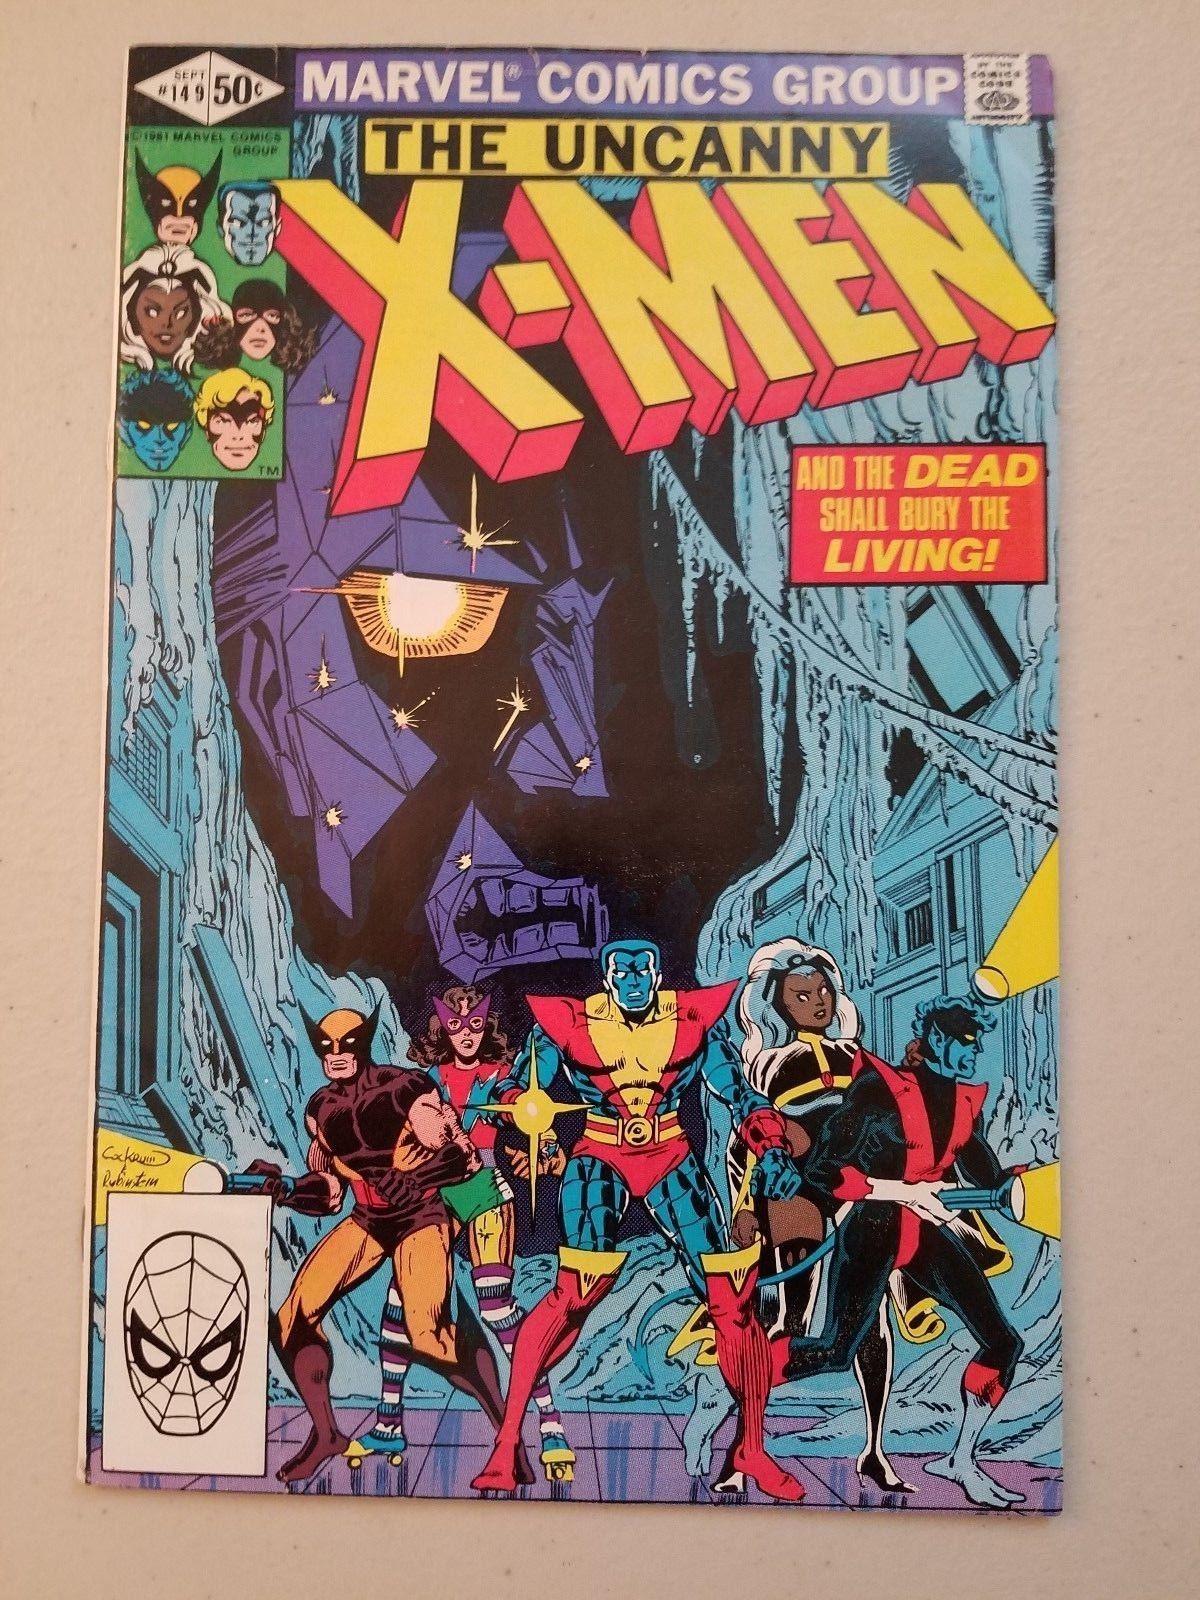 Uncanny X Men 149 8 5 1980 Marvel Comics Wolverine Storm Cyclops Phoenix 7 99 0 Bids End Date Sunday Apr Marvel Comic Books Marvel Comics Covers X Men